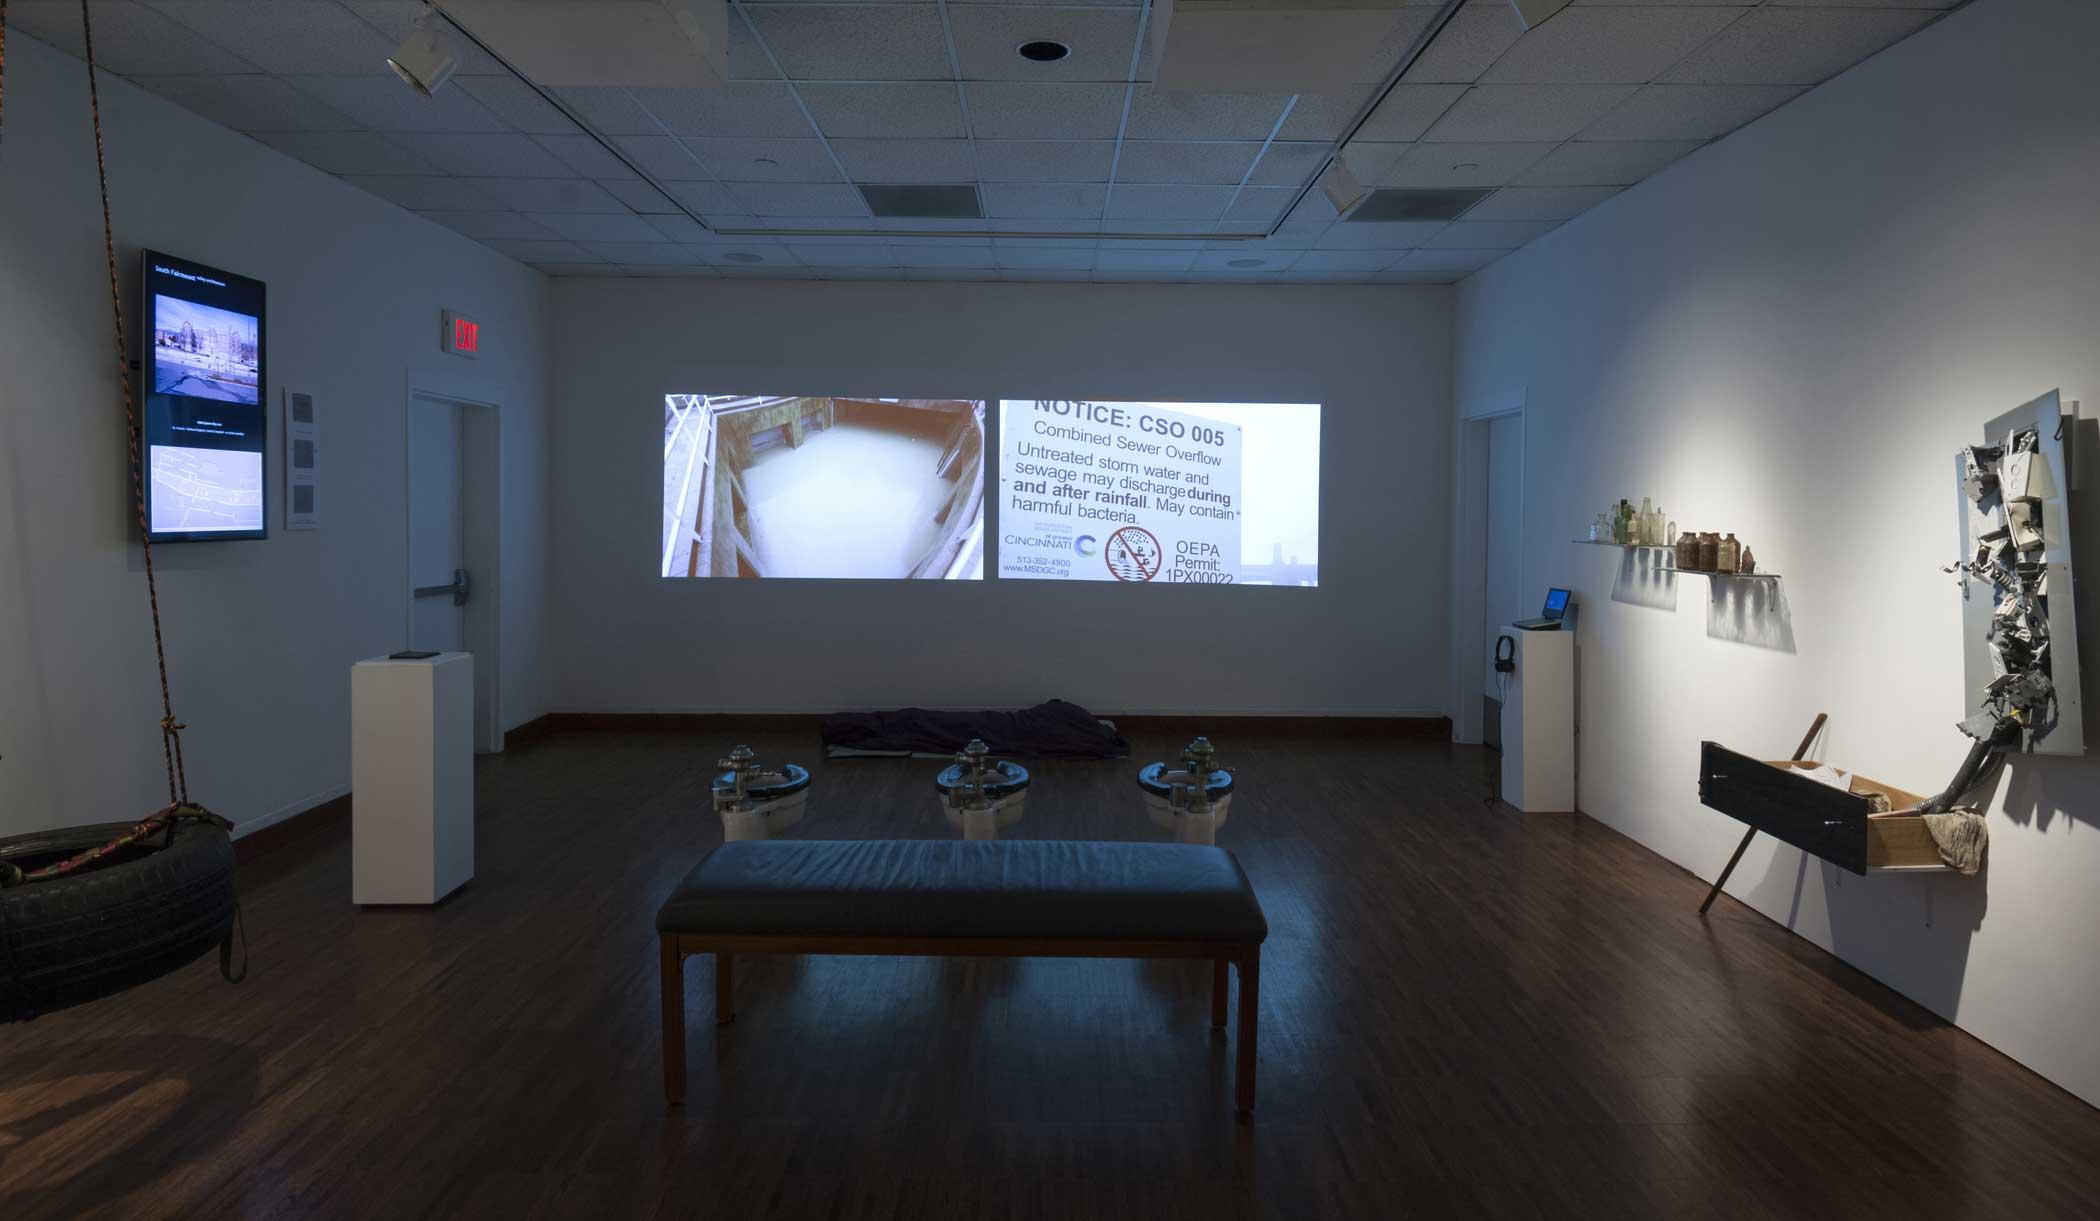 Numediacy---Lick-Run-Revival,-2014-15,-installation-view_sm